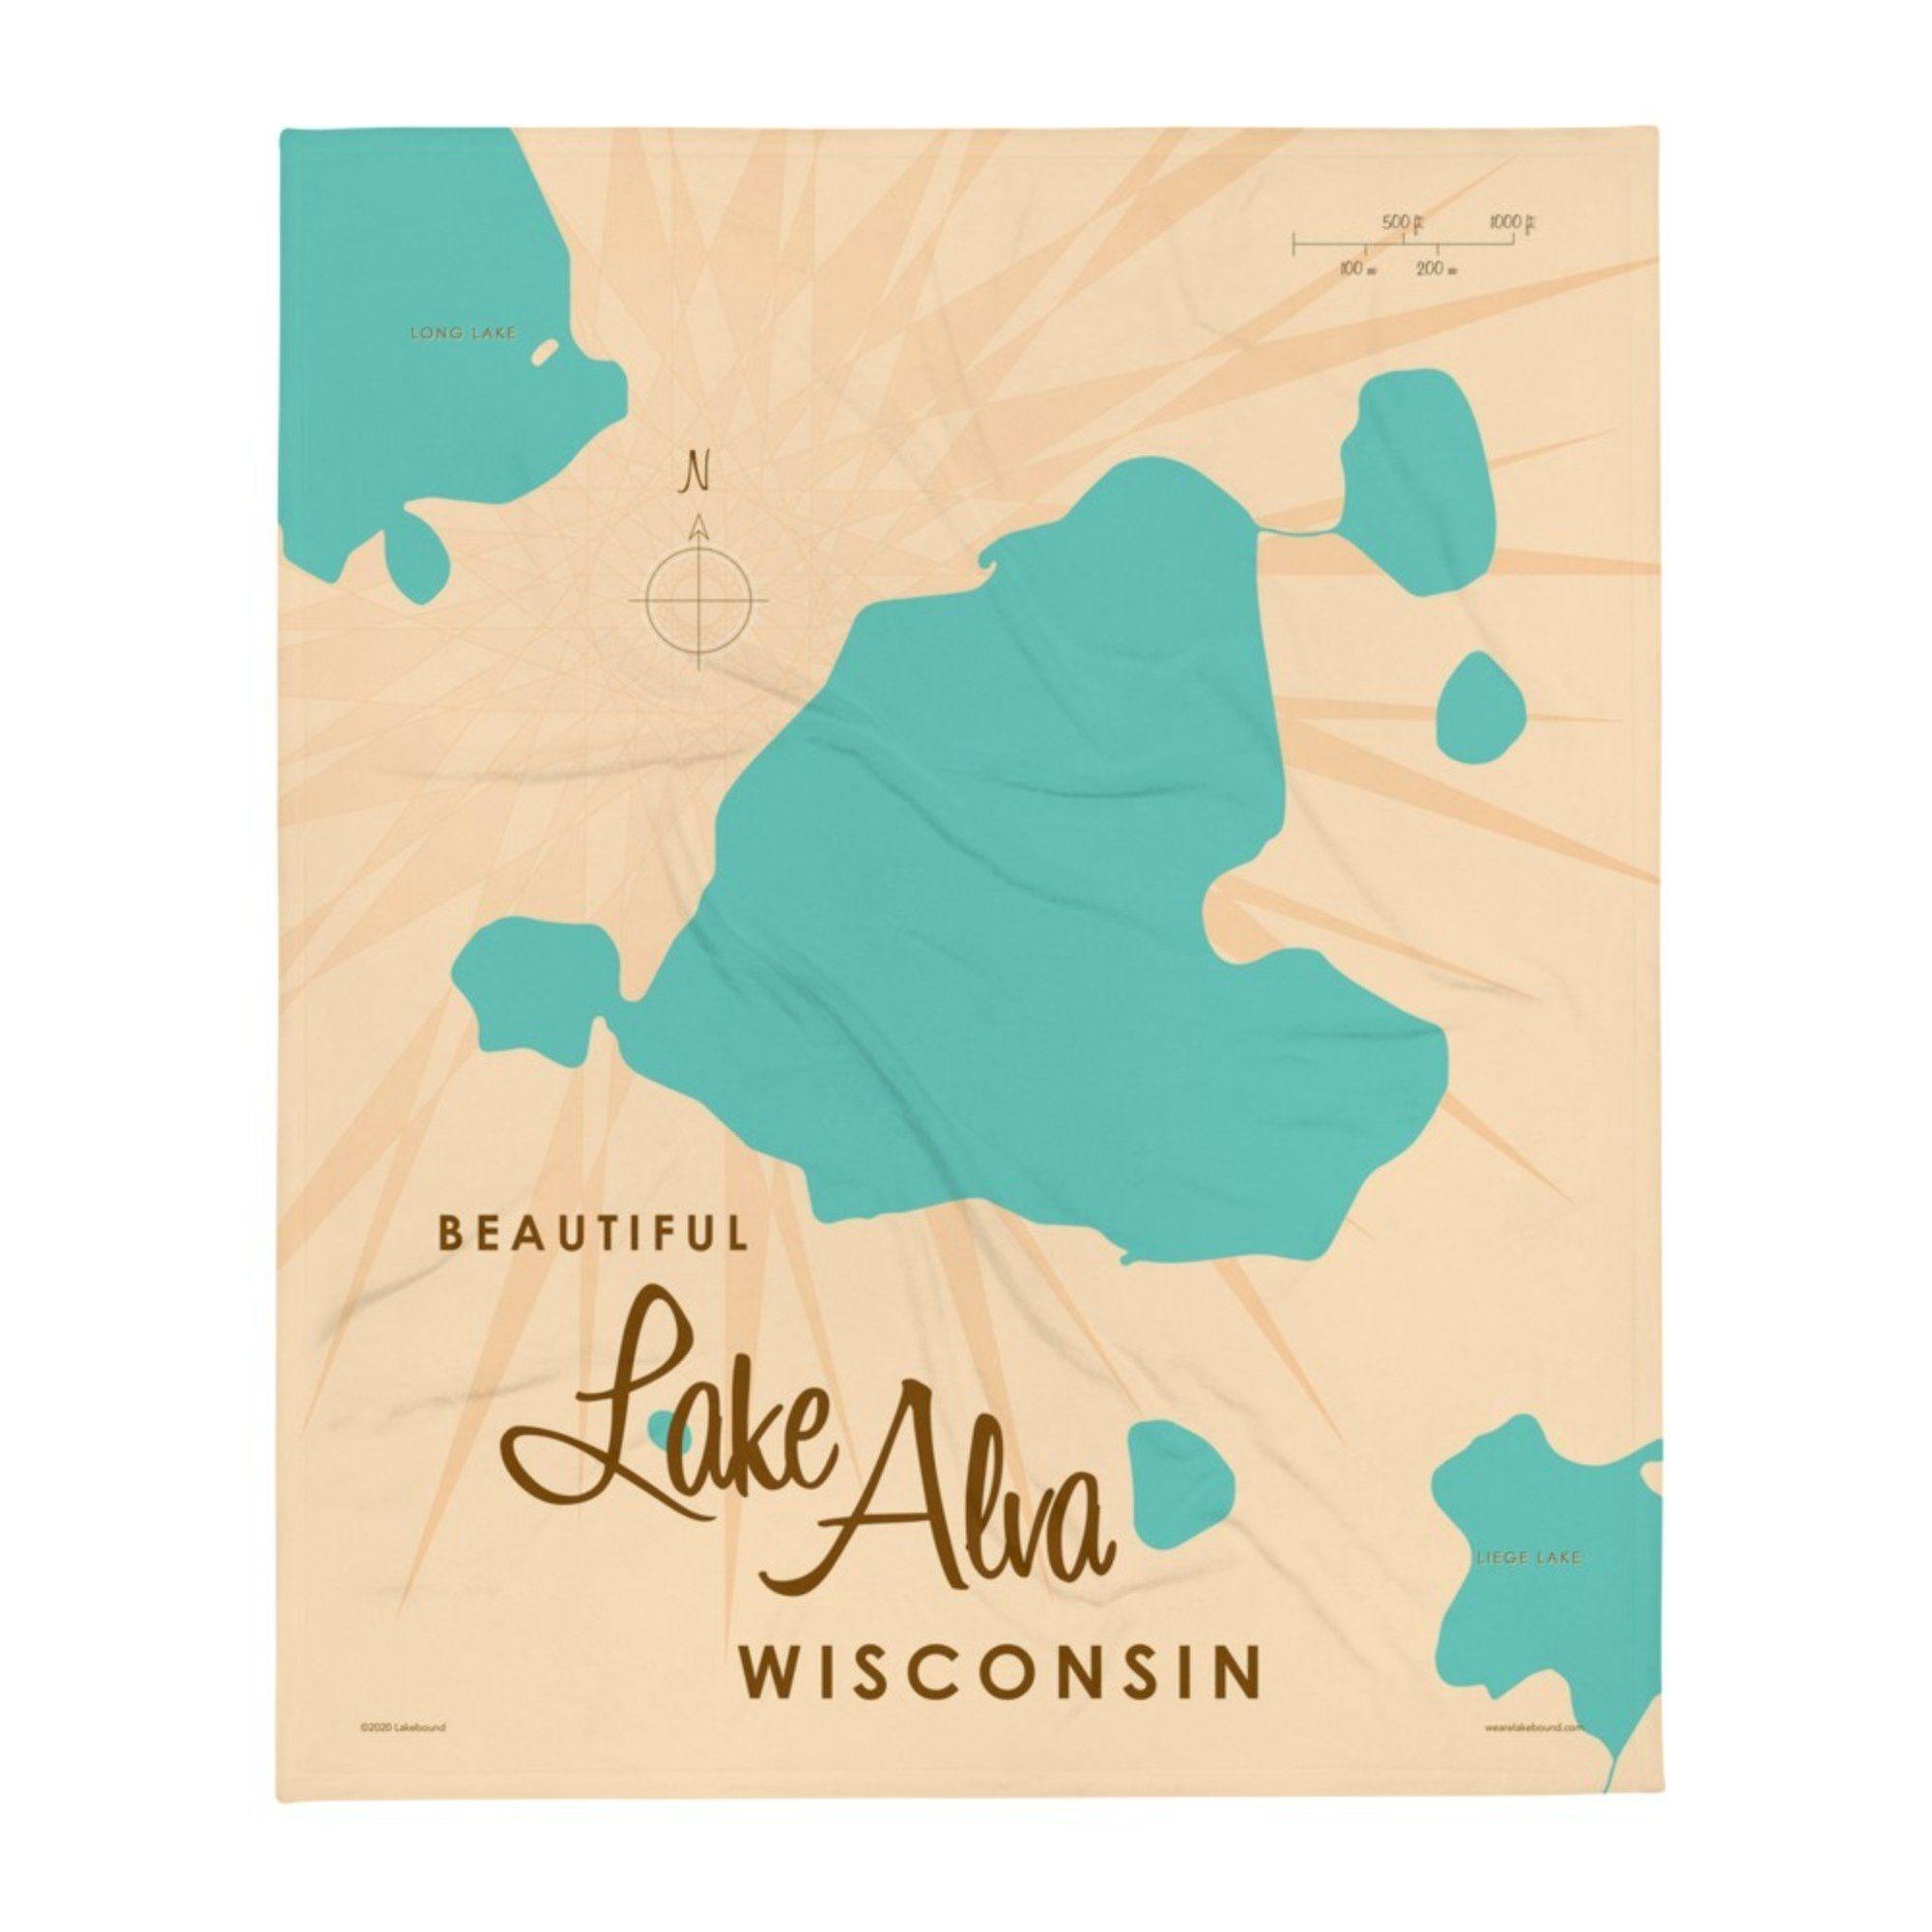 Lake Alva Wisconsin Throw Blanket - 50x60 inch / White